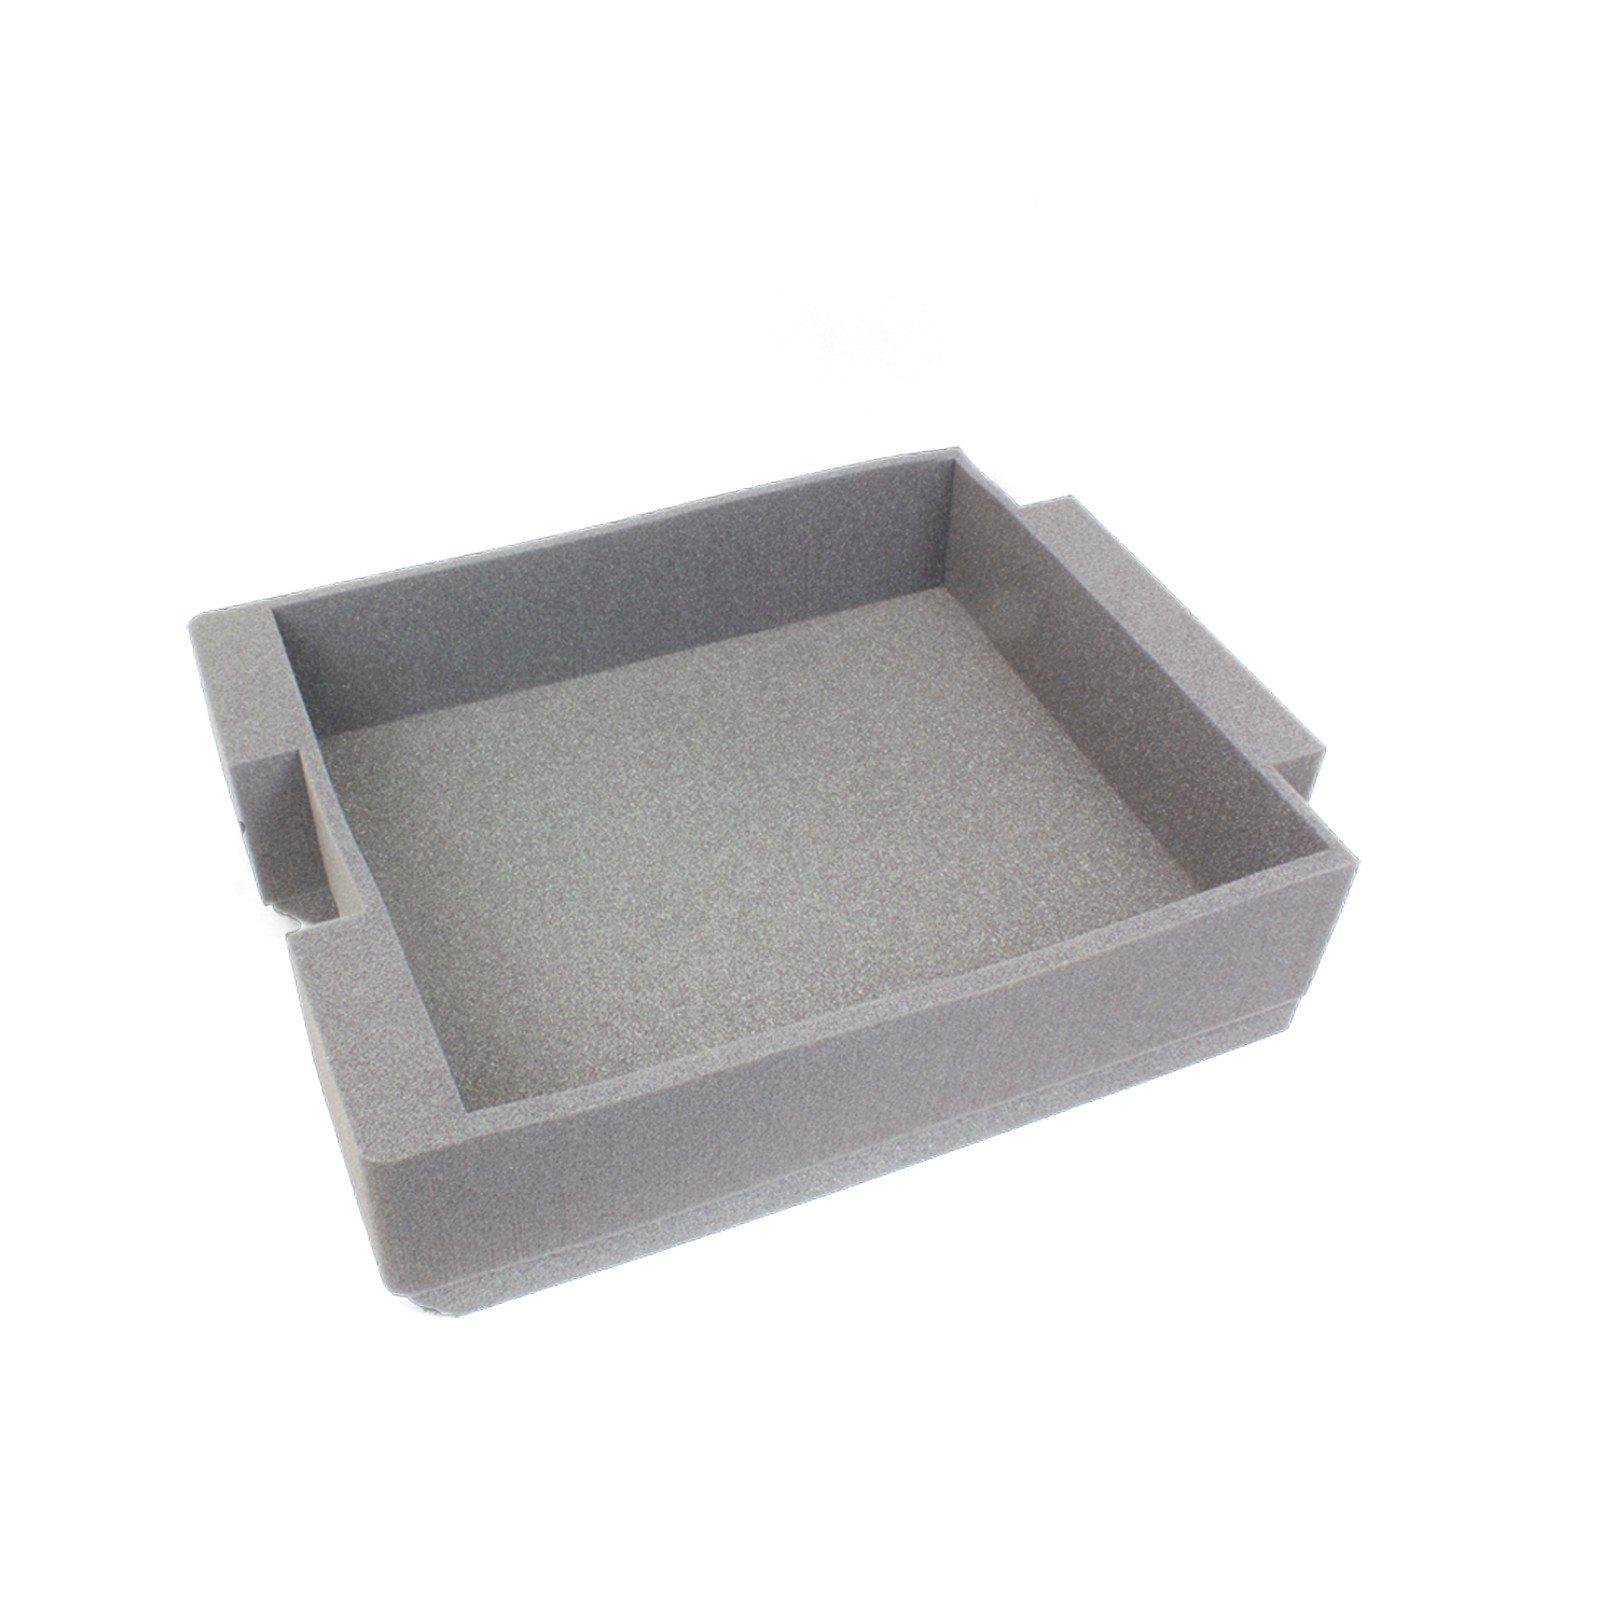 Williams Sound FMP 049, Foam Insert for CCS 053/CCS 054